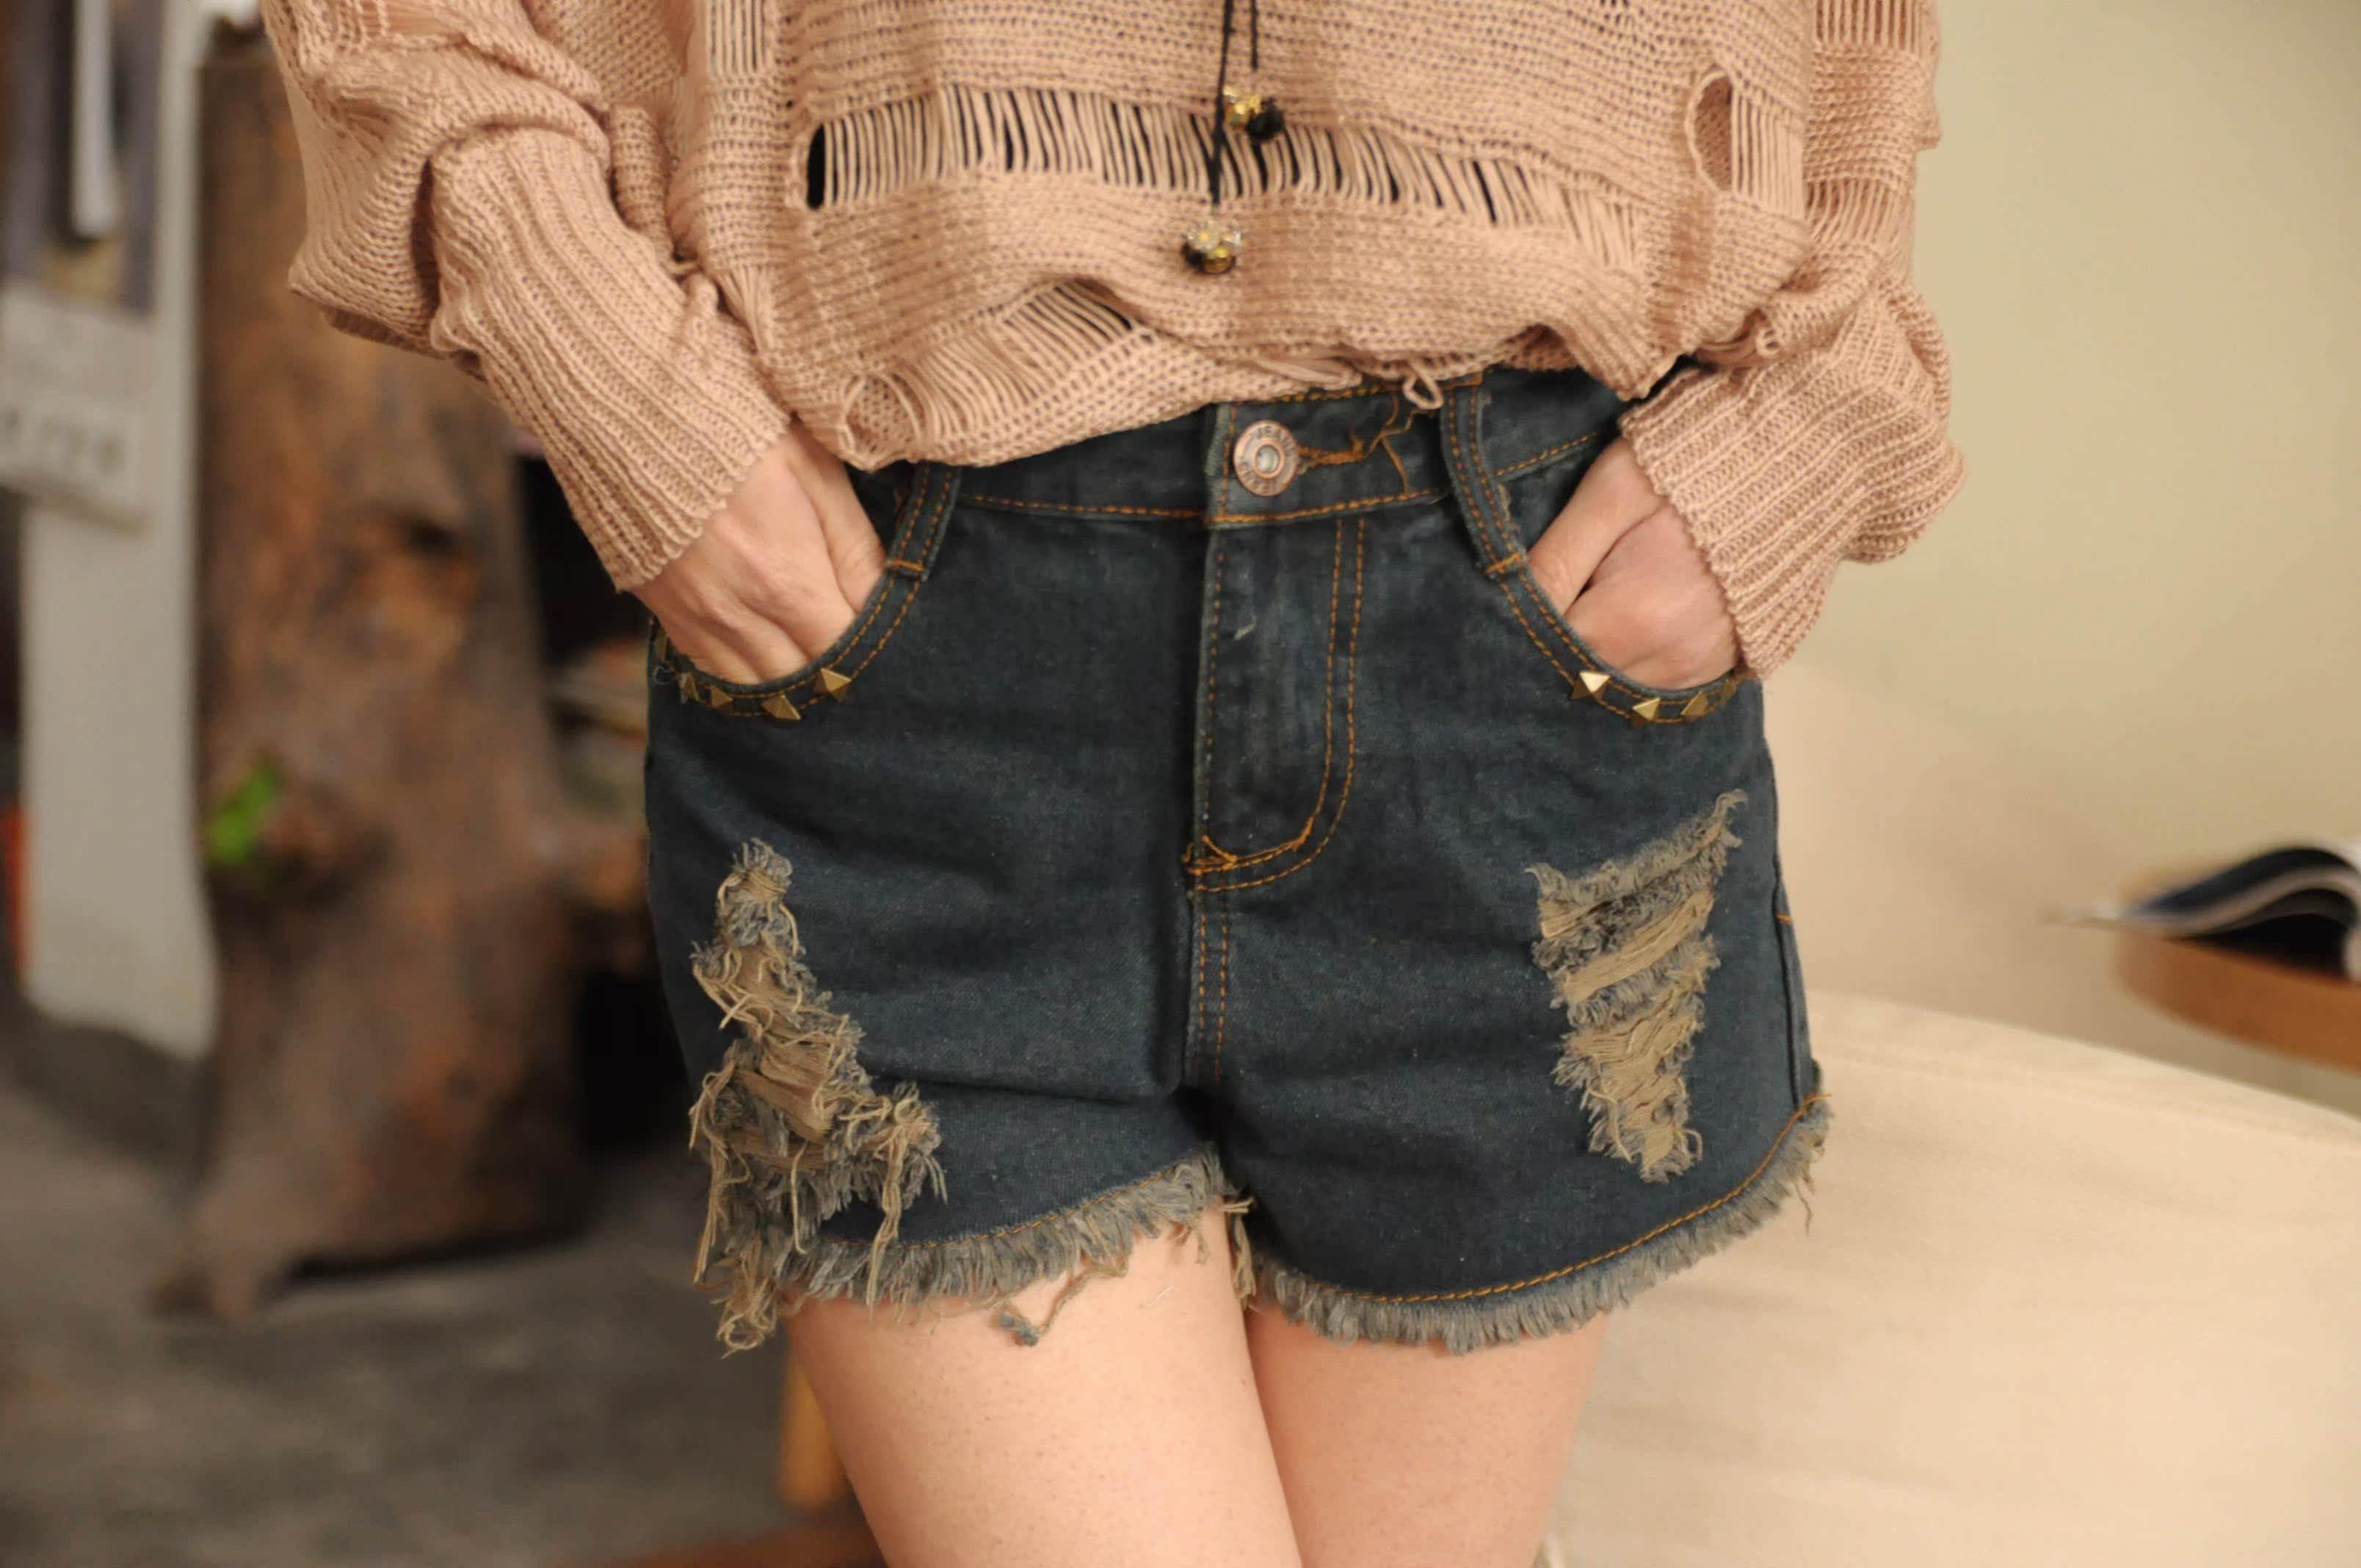 Женские брюки 806a605 p45 Шорты, мини-шорты Другая форма брюк